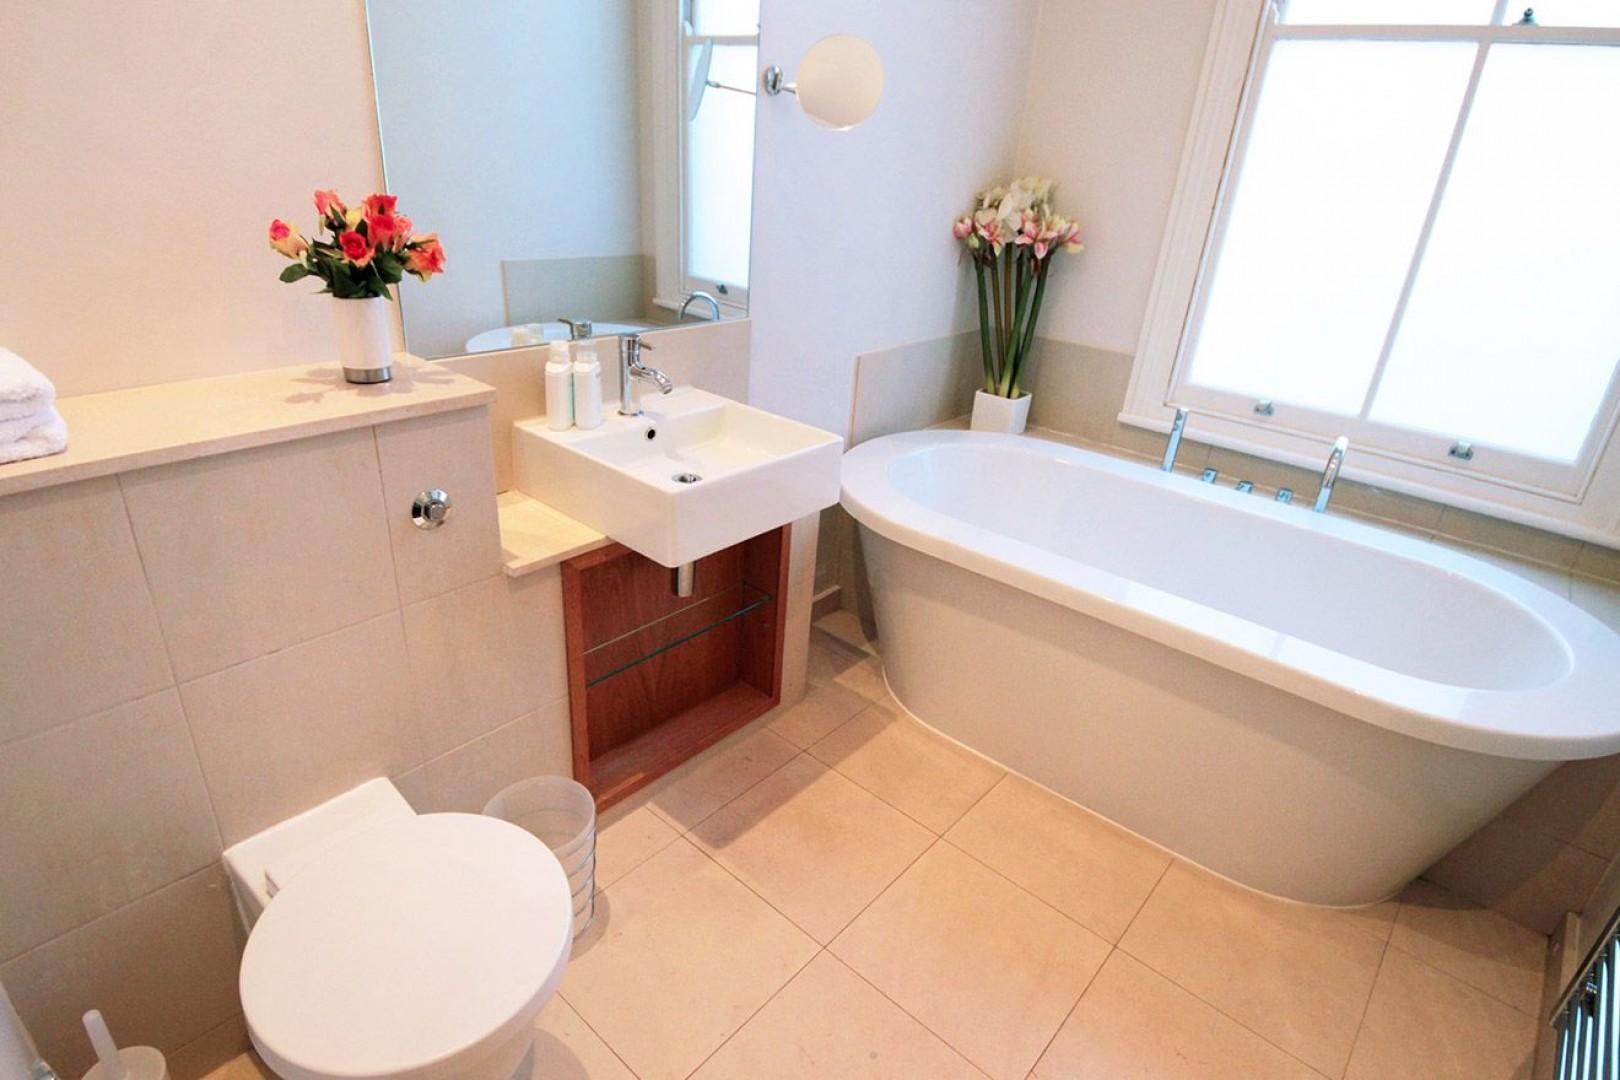 En suite bathroom with bathtub, toilet and sink